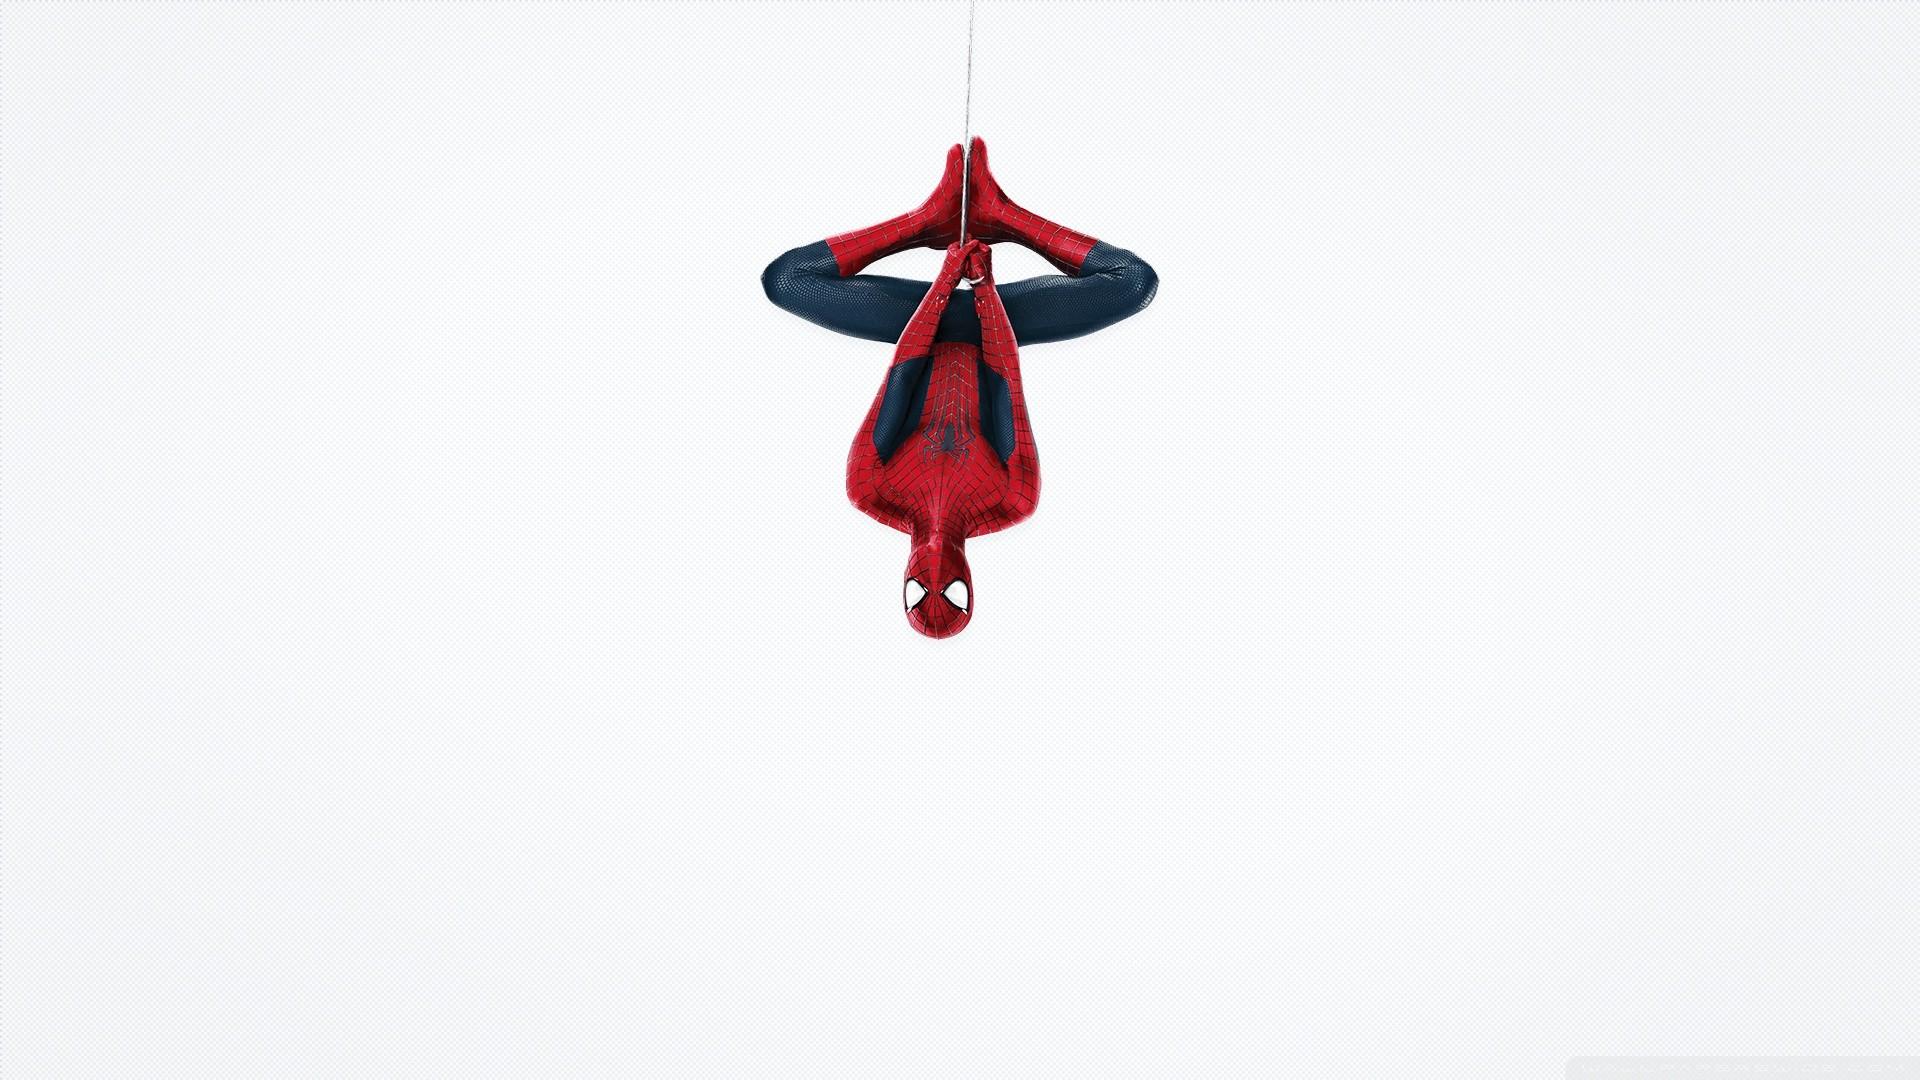 07-Apr-2015_3   Ceyhun Kirimli   Pinterest   Amazing spider and Wallpaper